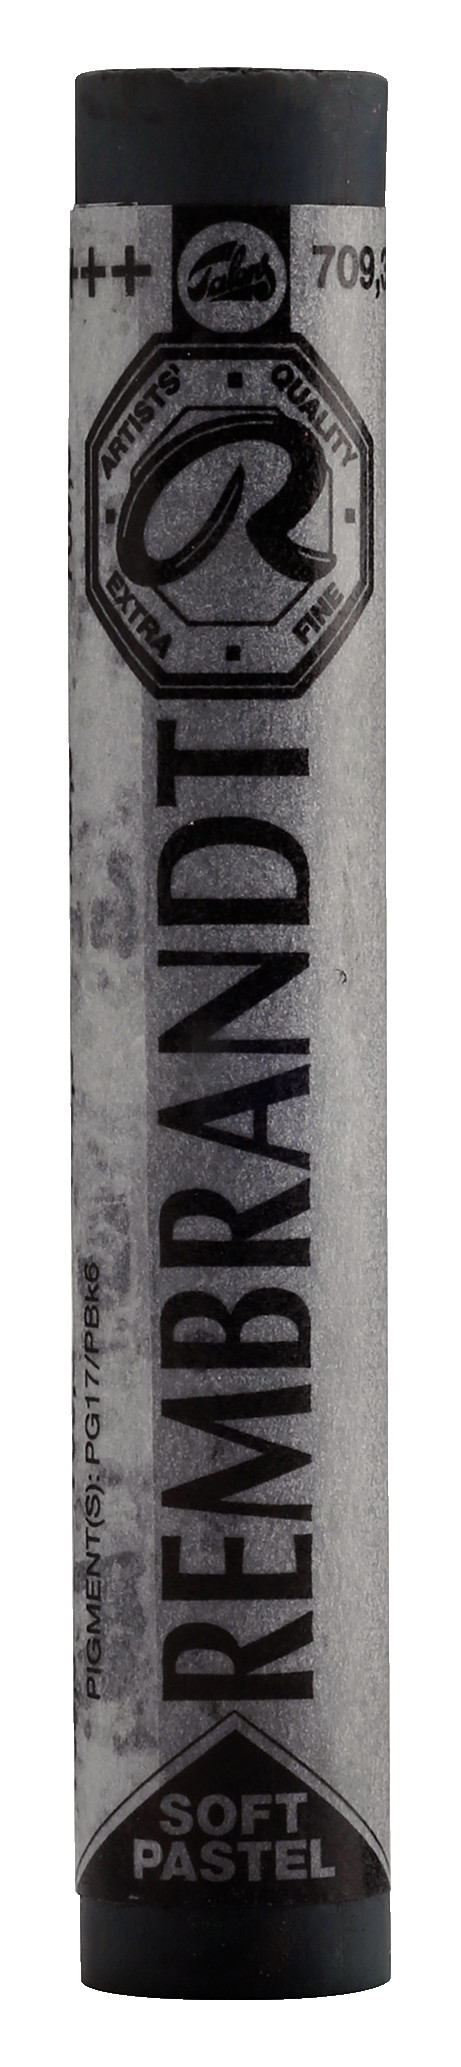 Rembrandt Soft Pastel Round Full Stick Green Grey(3) (709.3)